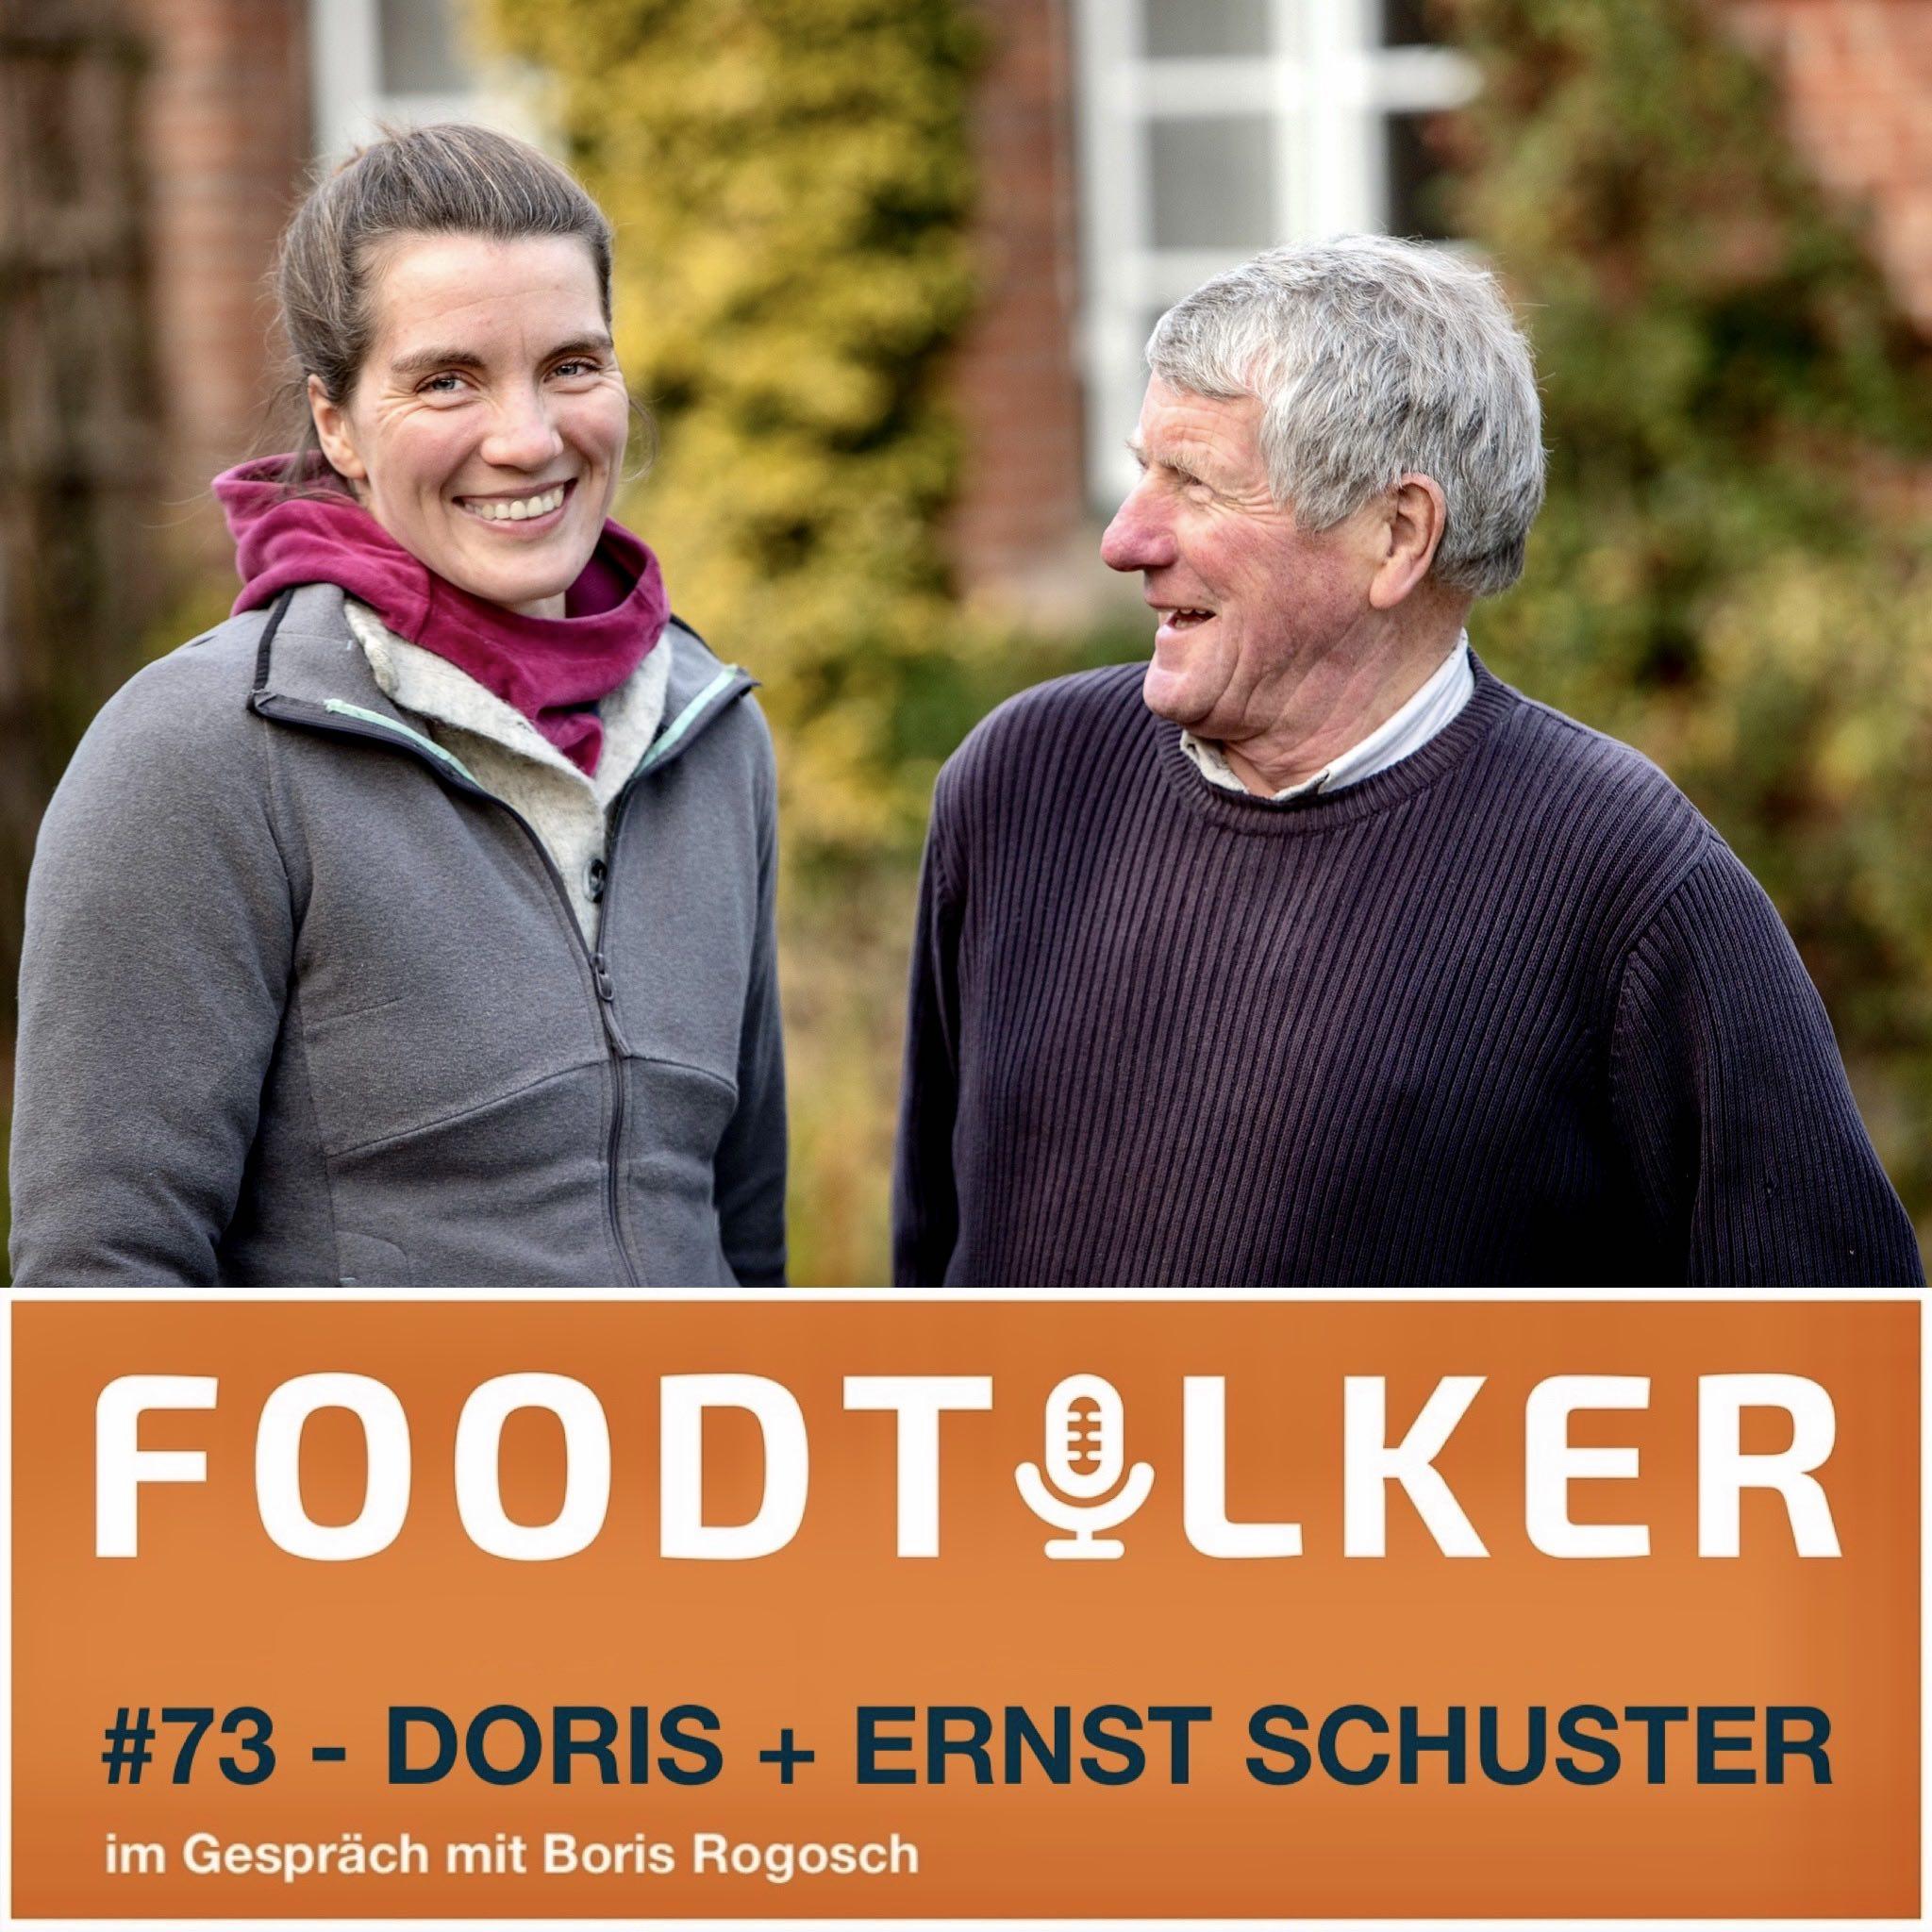 Doris + Ernst Schuster*